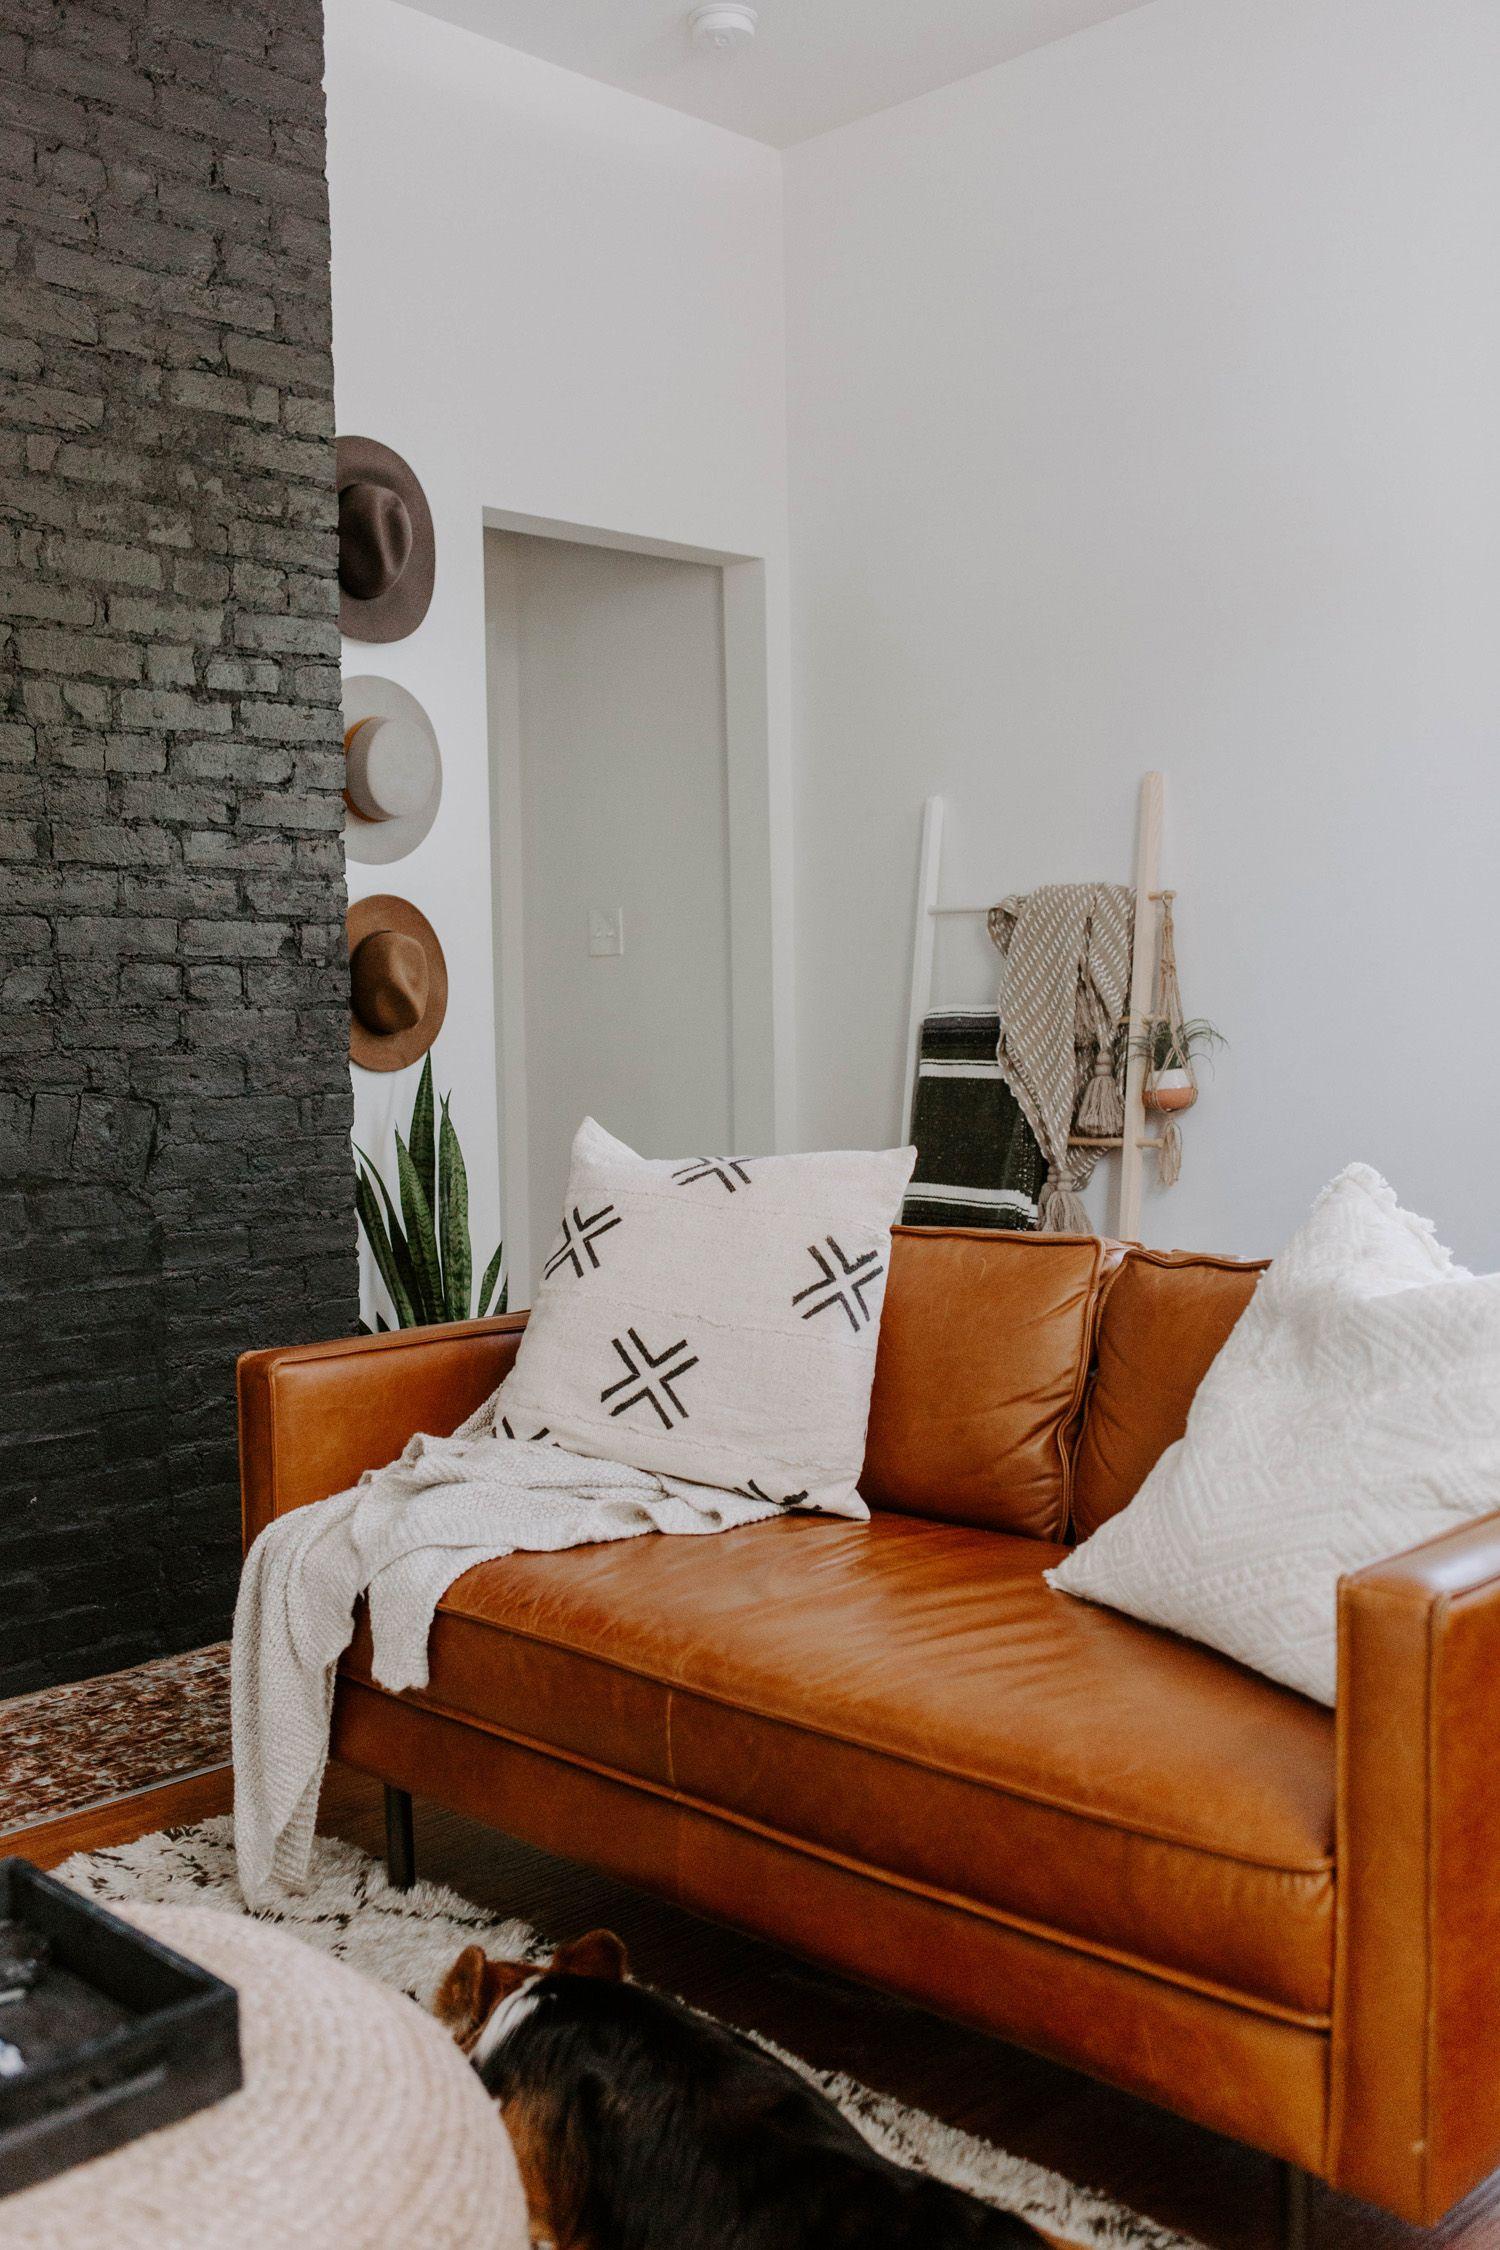 Minimalistic Rooms